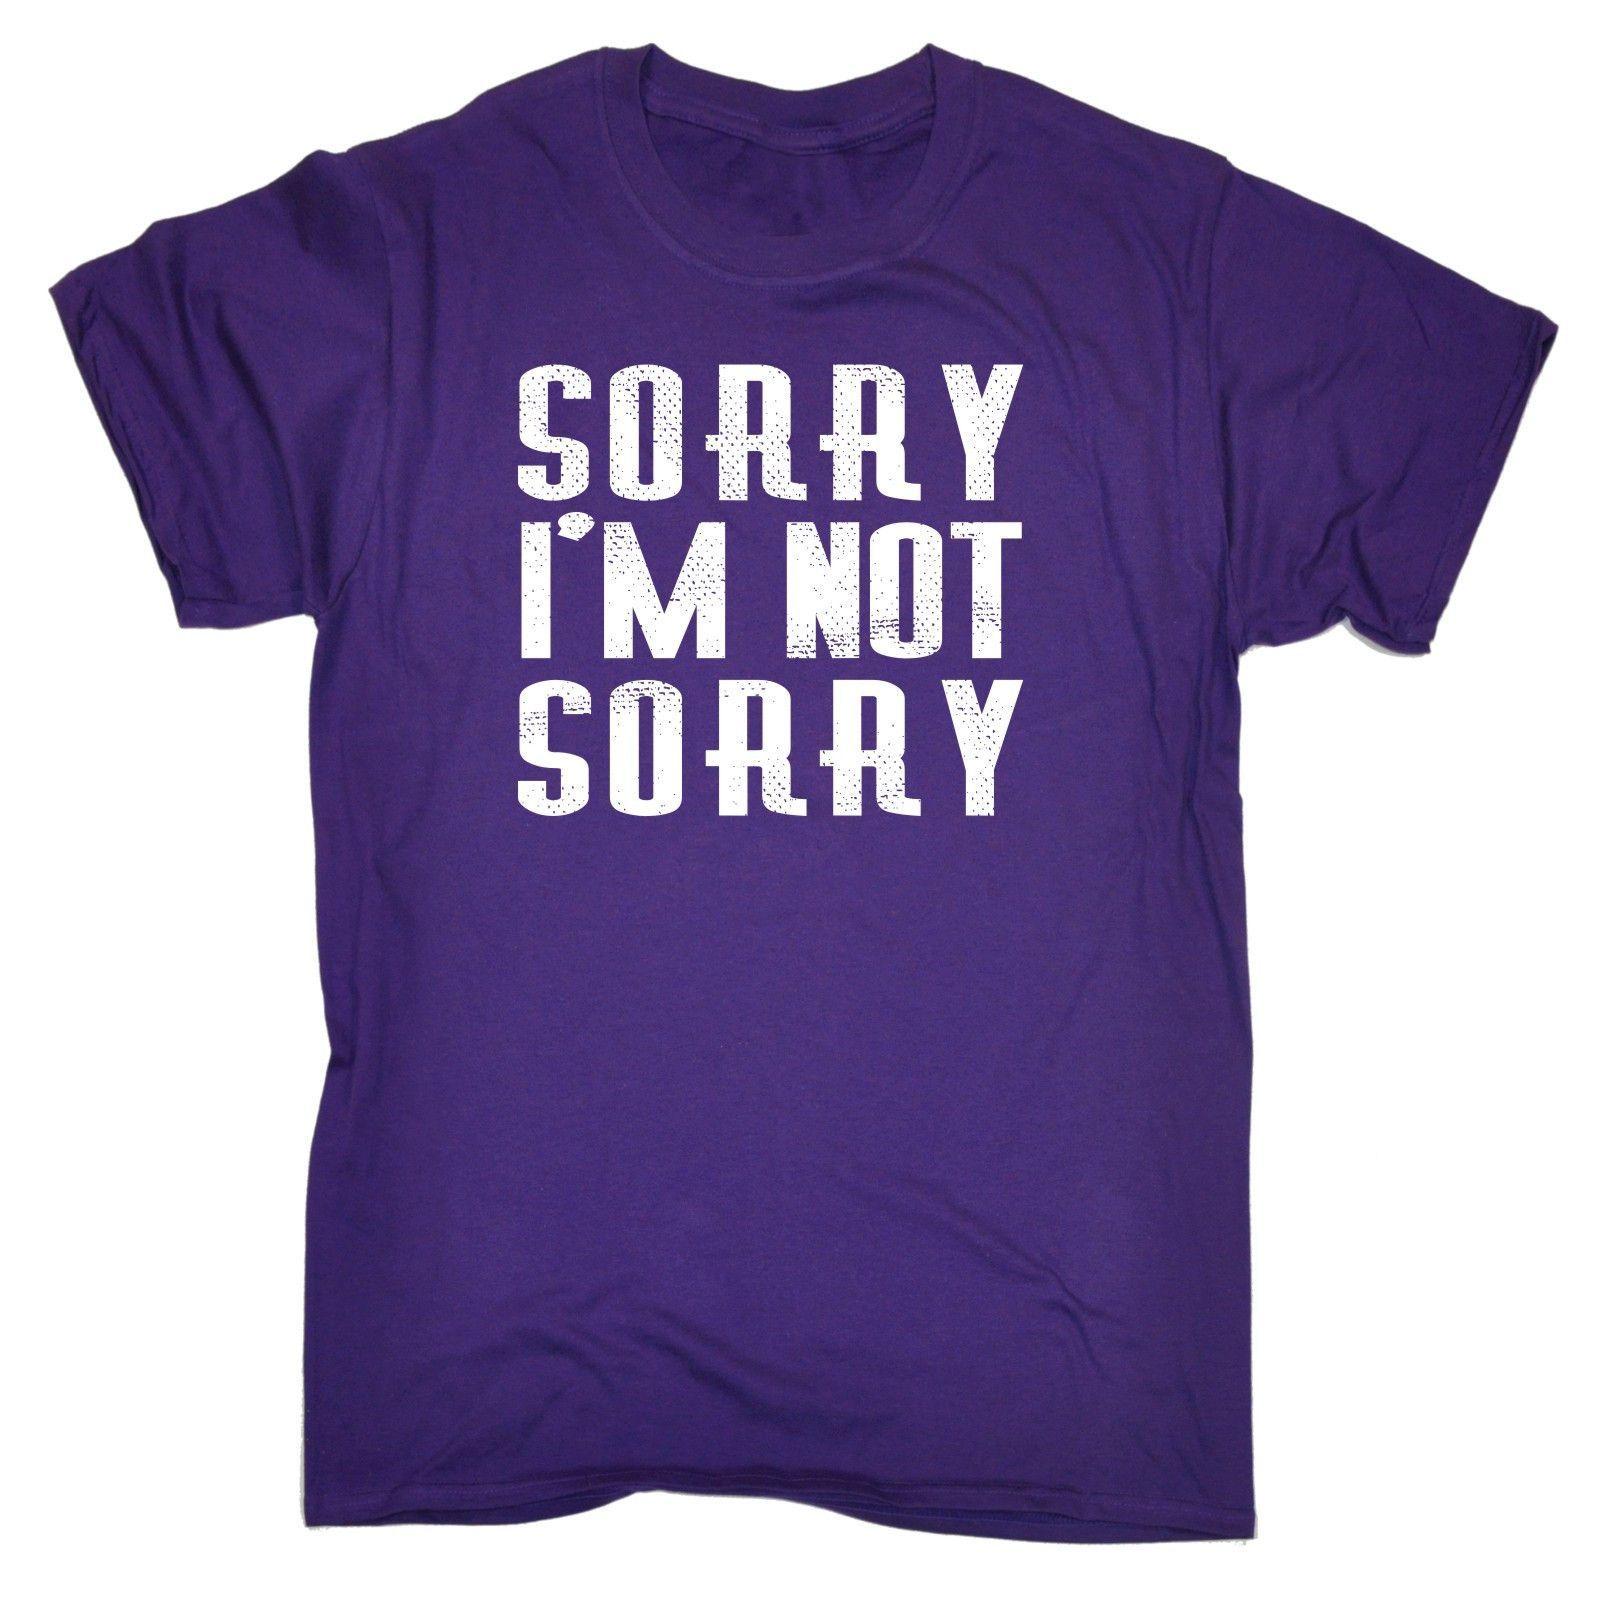 123t USA Men's Sorry I'm Not Sorry Funny T-Shirt